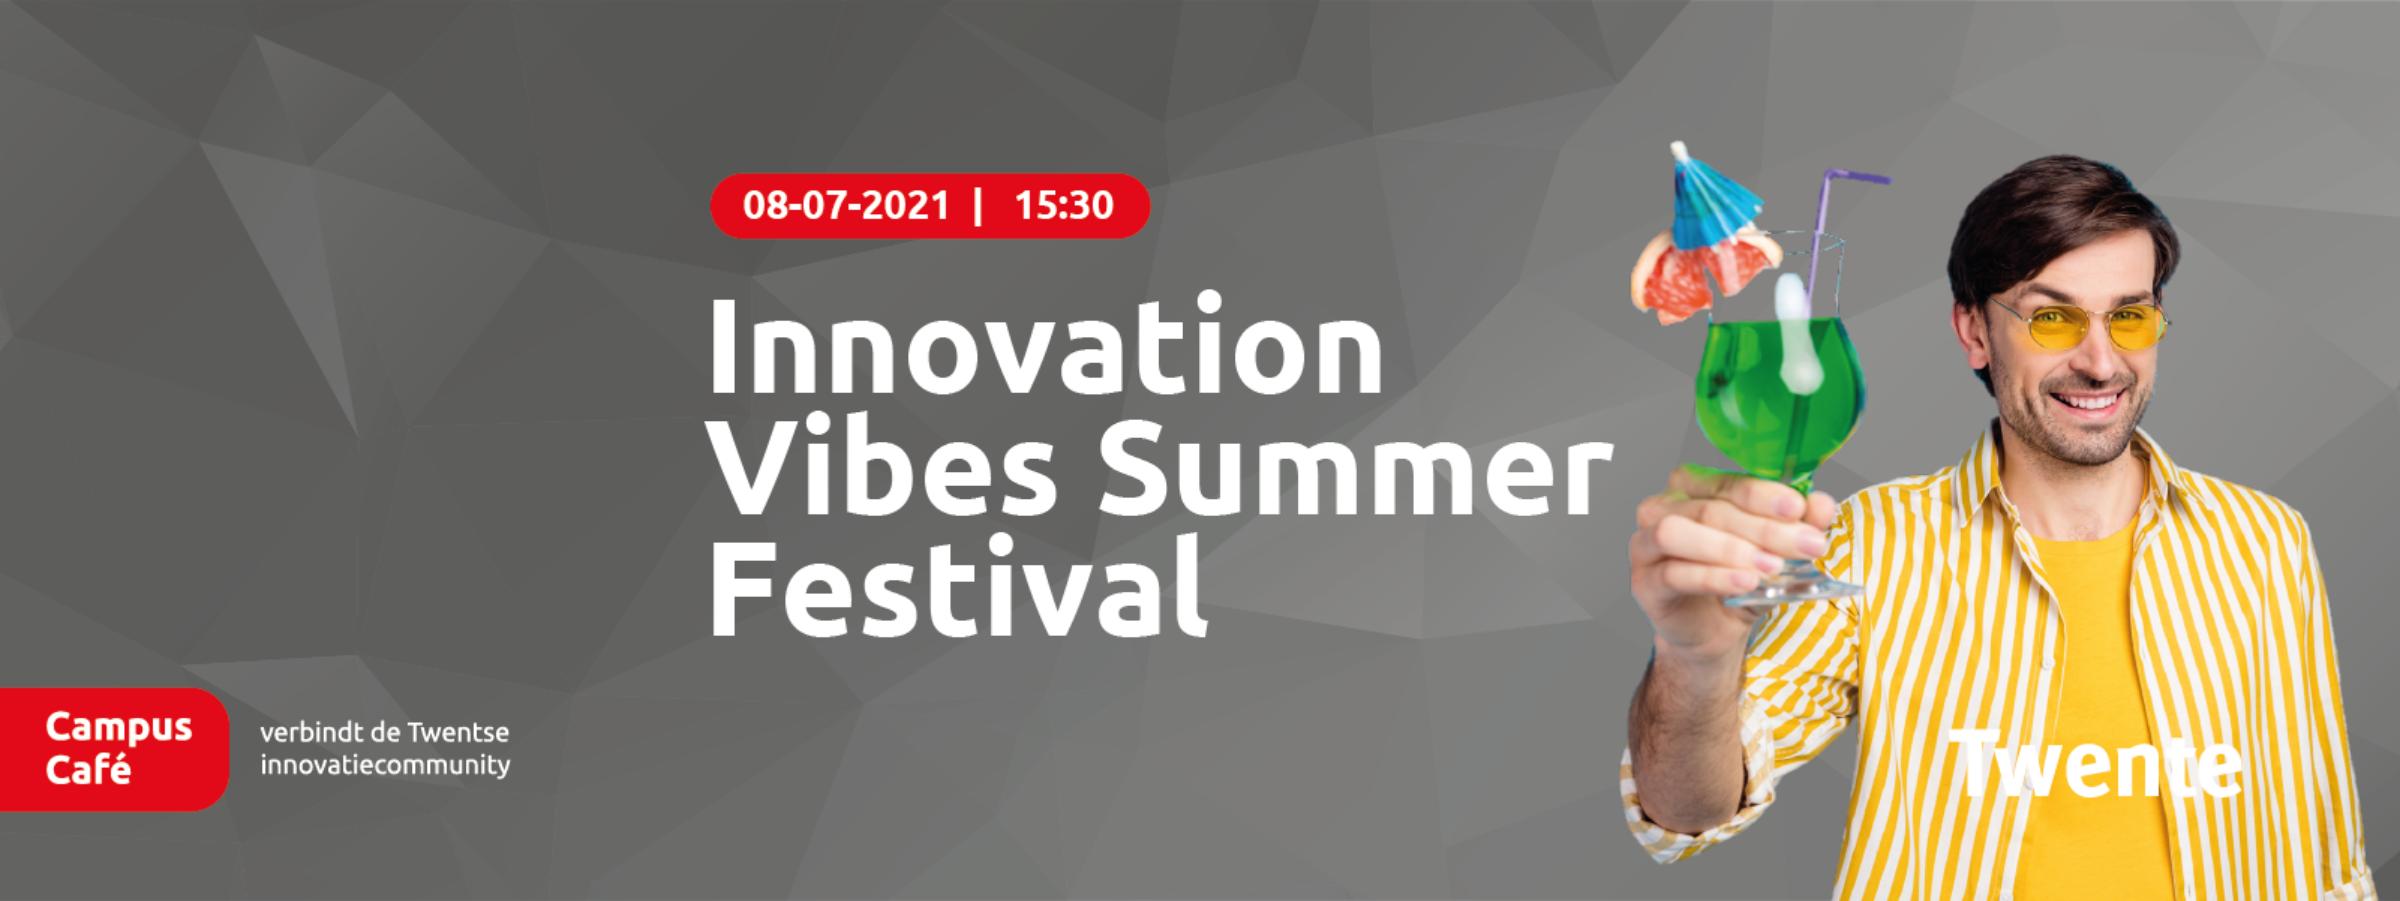 Innovation vibes